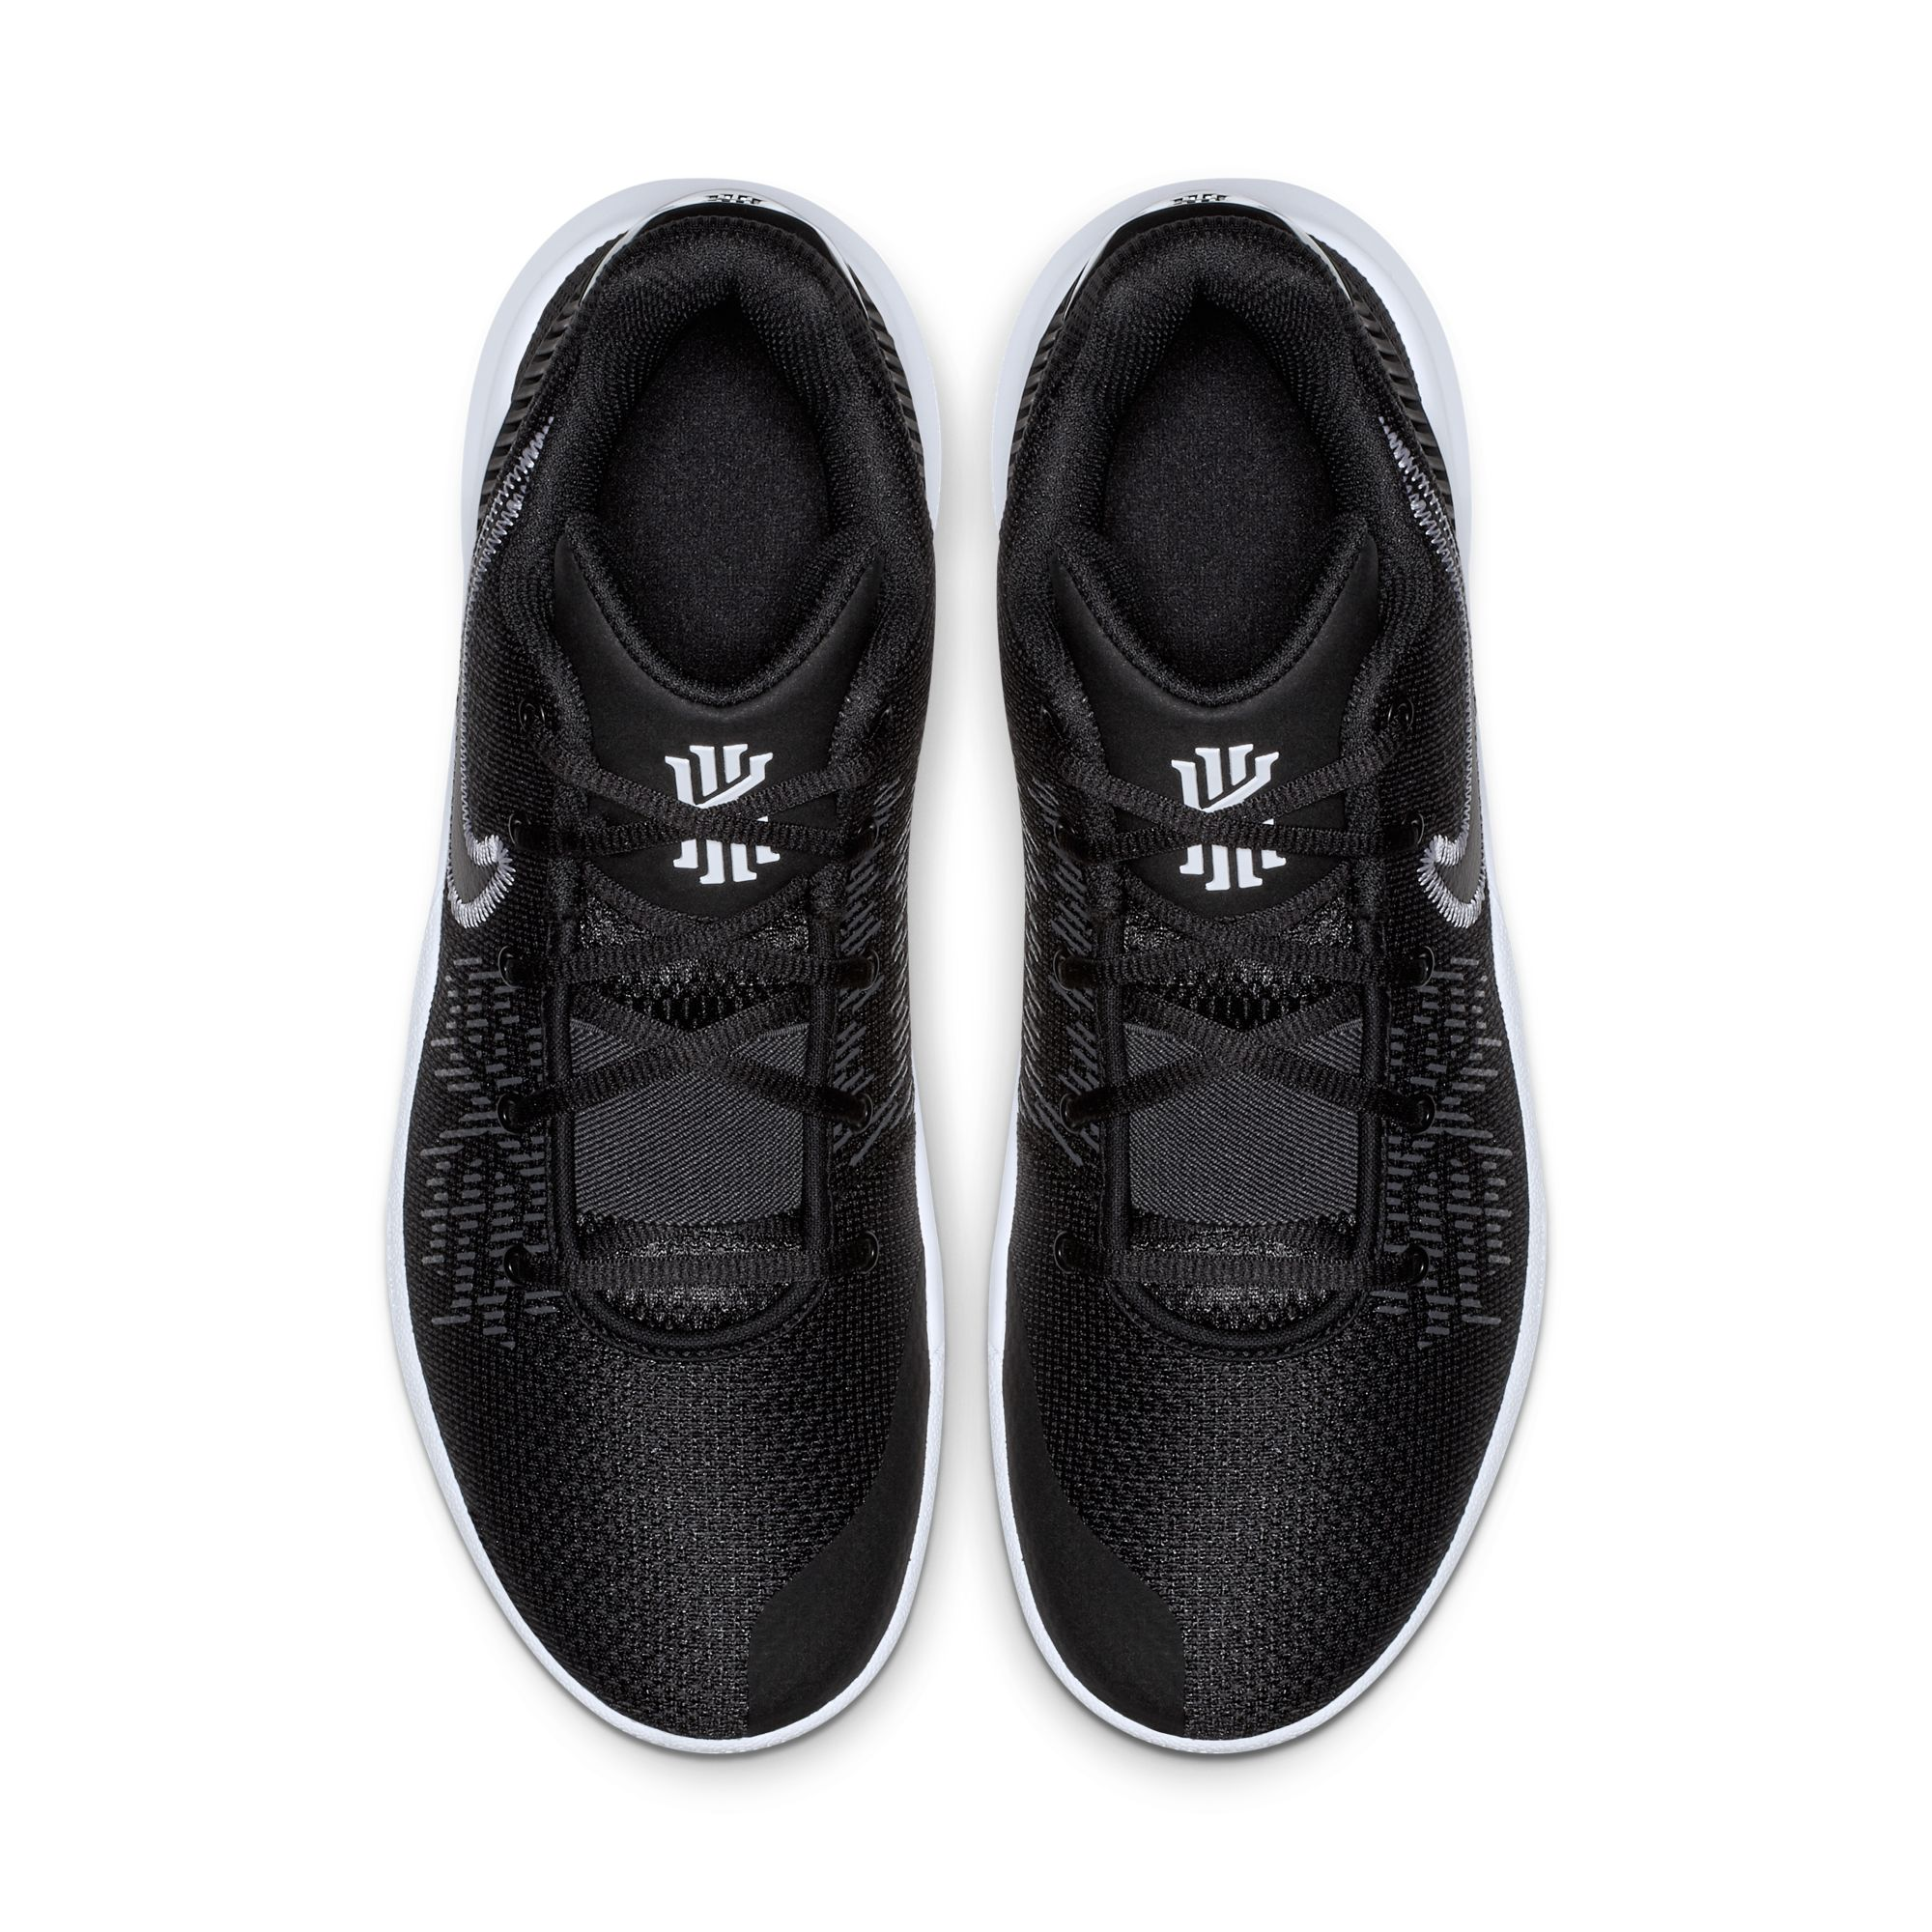 Nike Kyrie Flytrap 2 'Black' 2